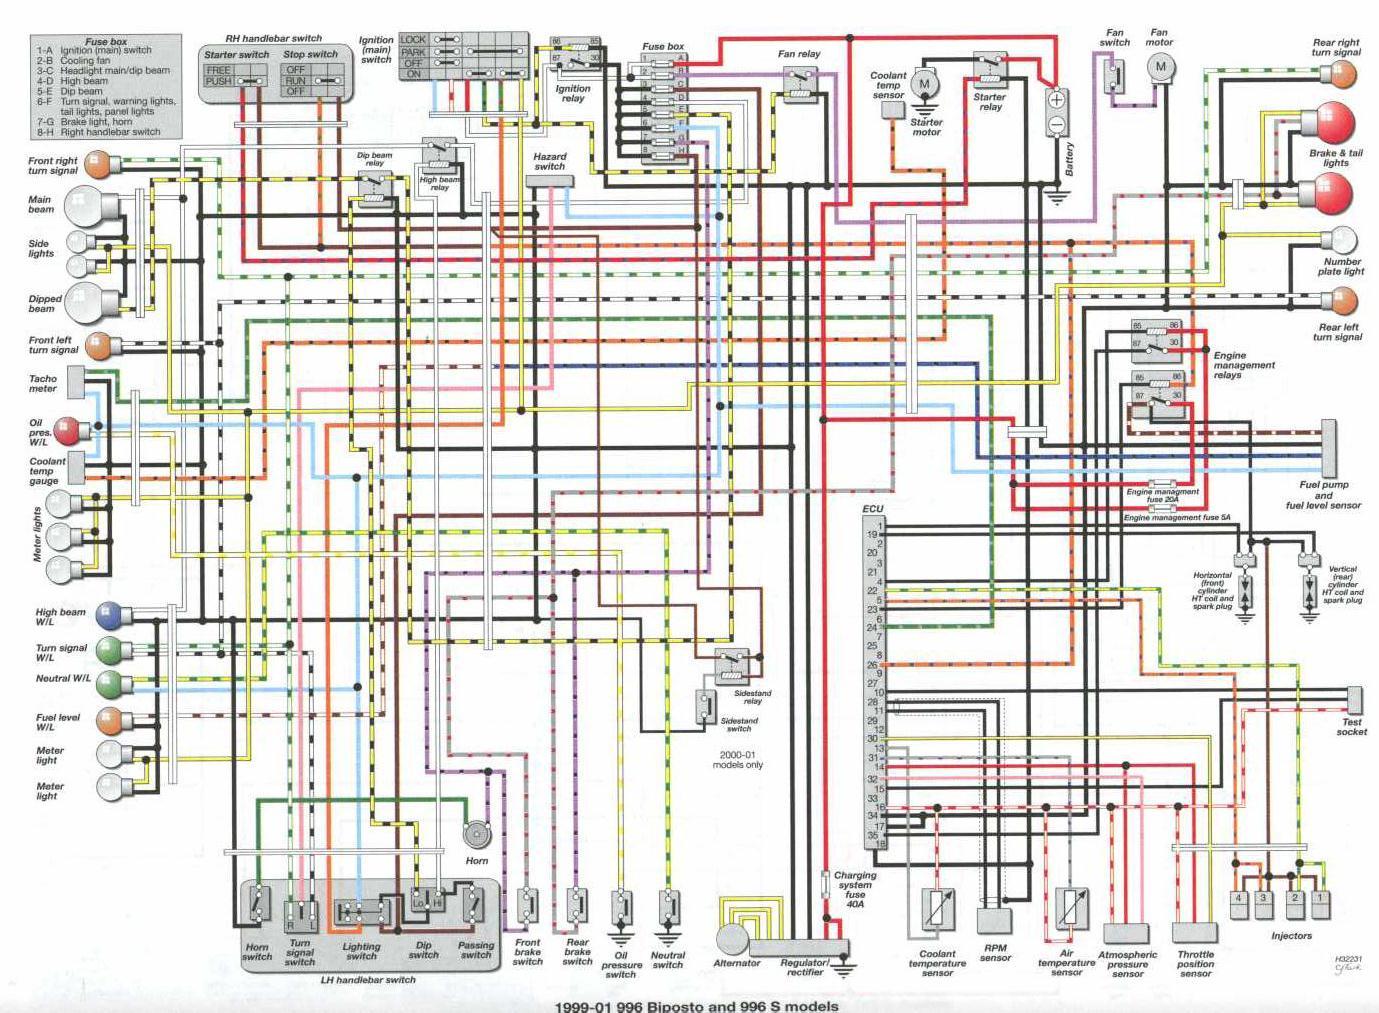 hight resolution of 2000 996 fuel pump issues ducati ms the ultimate ducati forum kawasaki atv wiring diagram ducati paso wiring diagram